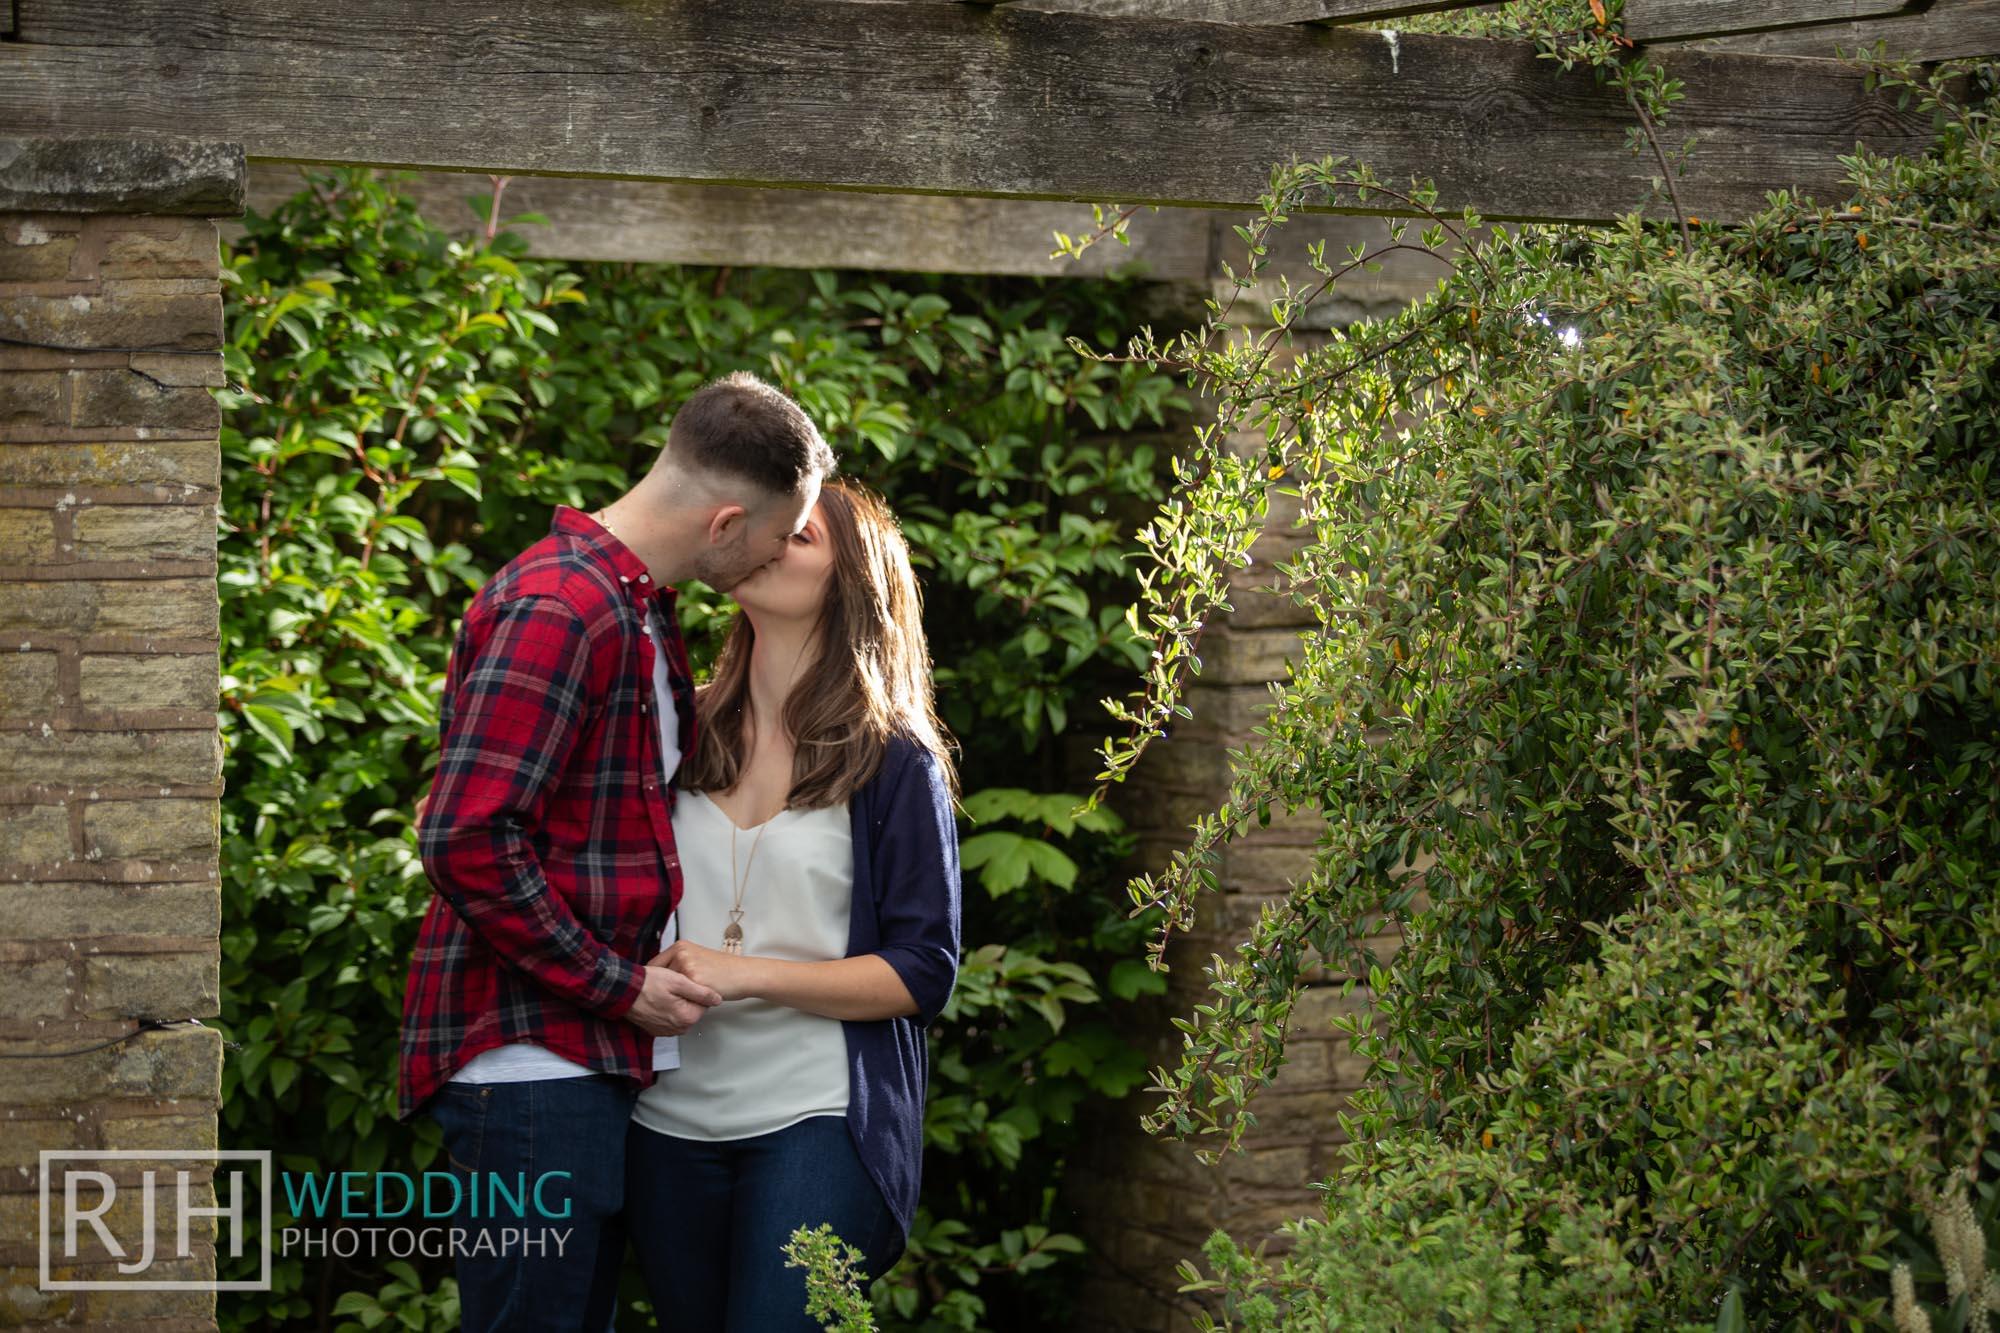 Pre-wedding photography_Abbie & Reece_Graves Park_001_IMG_1124.jpg